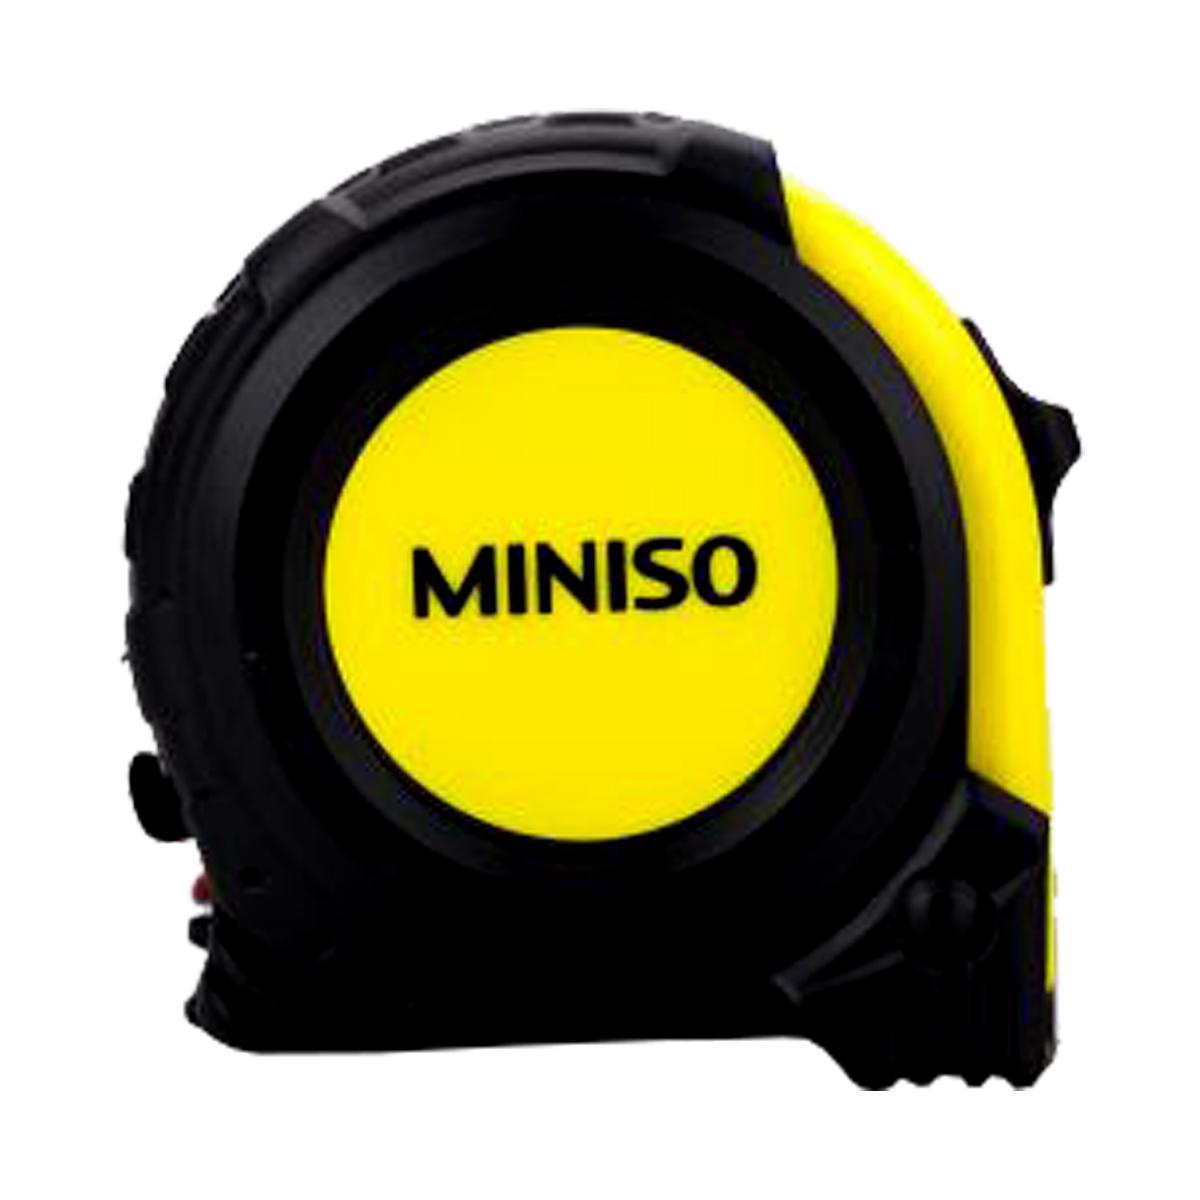 Miniso Philippines Miniso Price List Power Banks Computer Mice